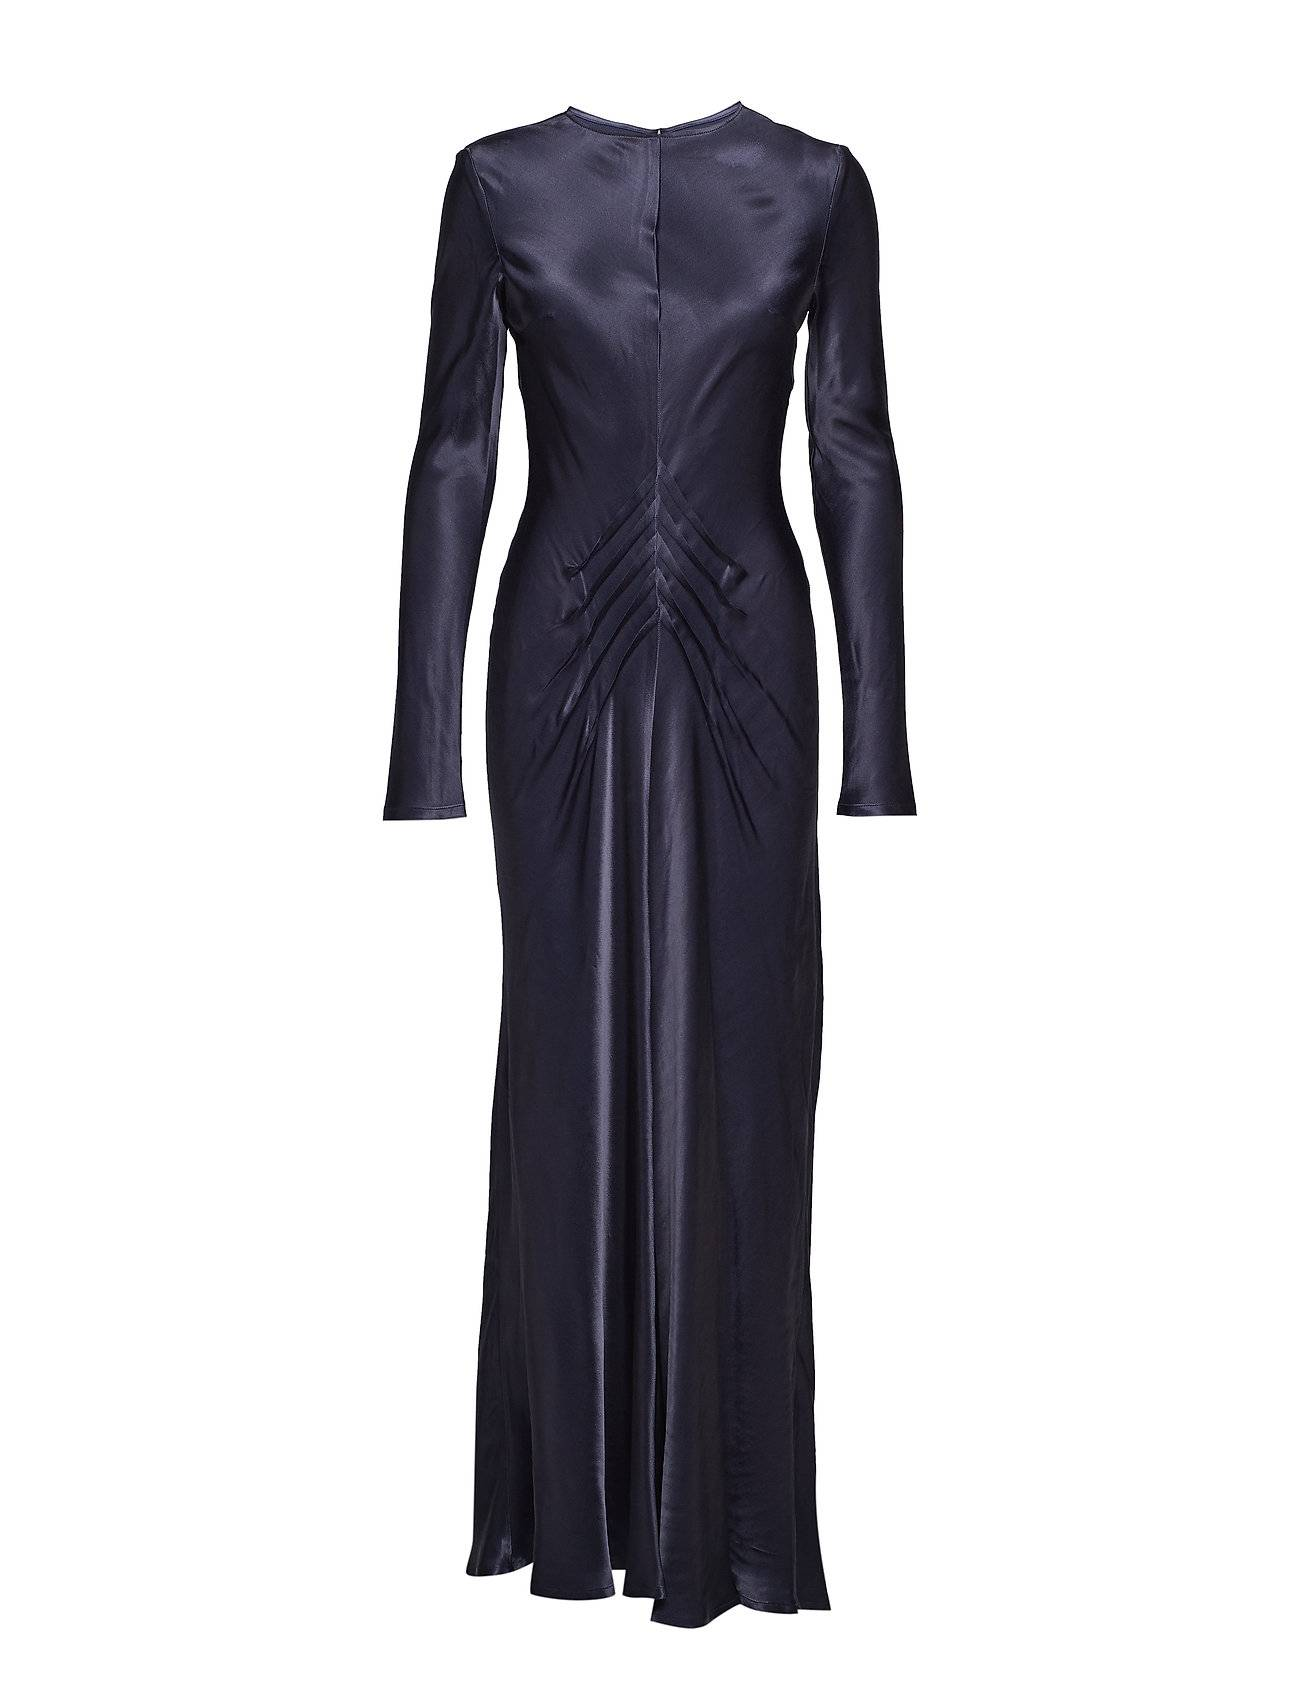 Diana Orving Long Bias Dress